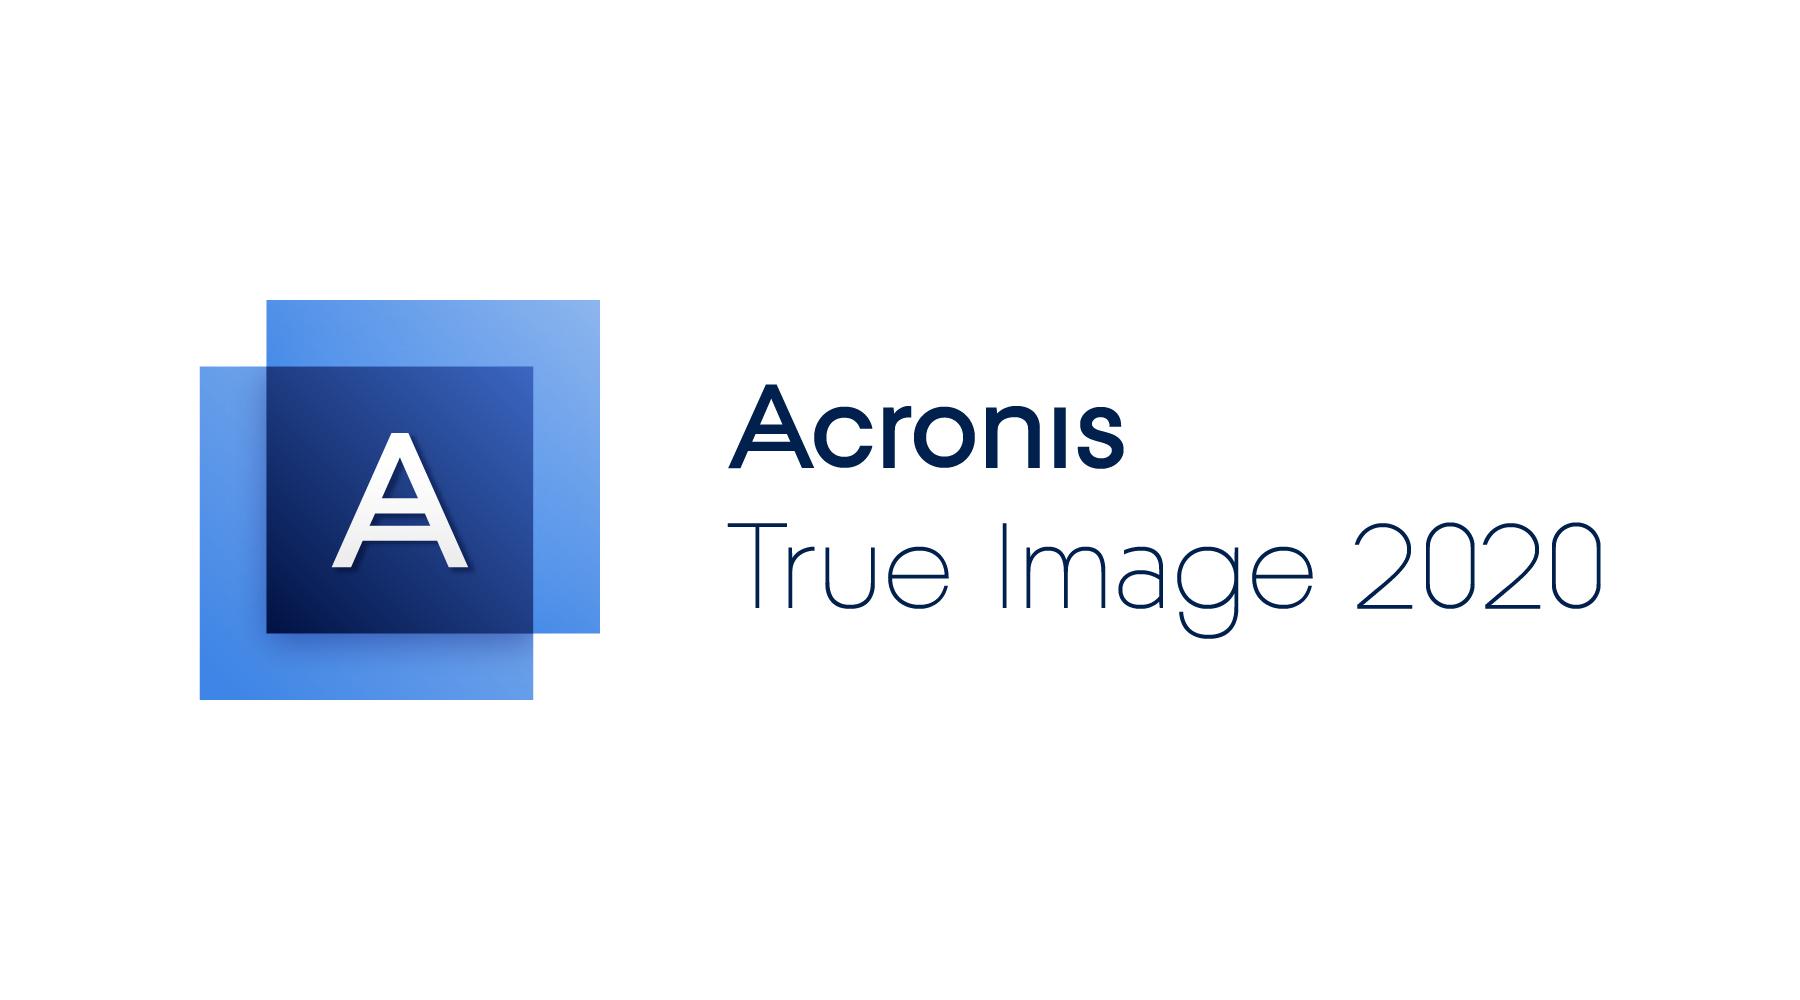 Acronis True Image 2020 Logo